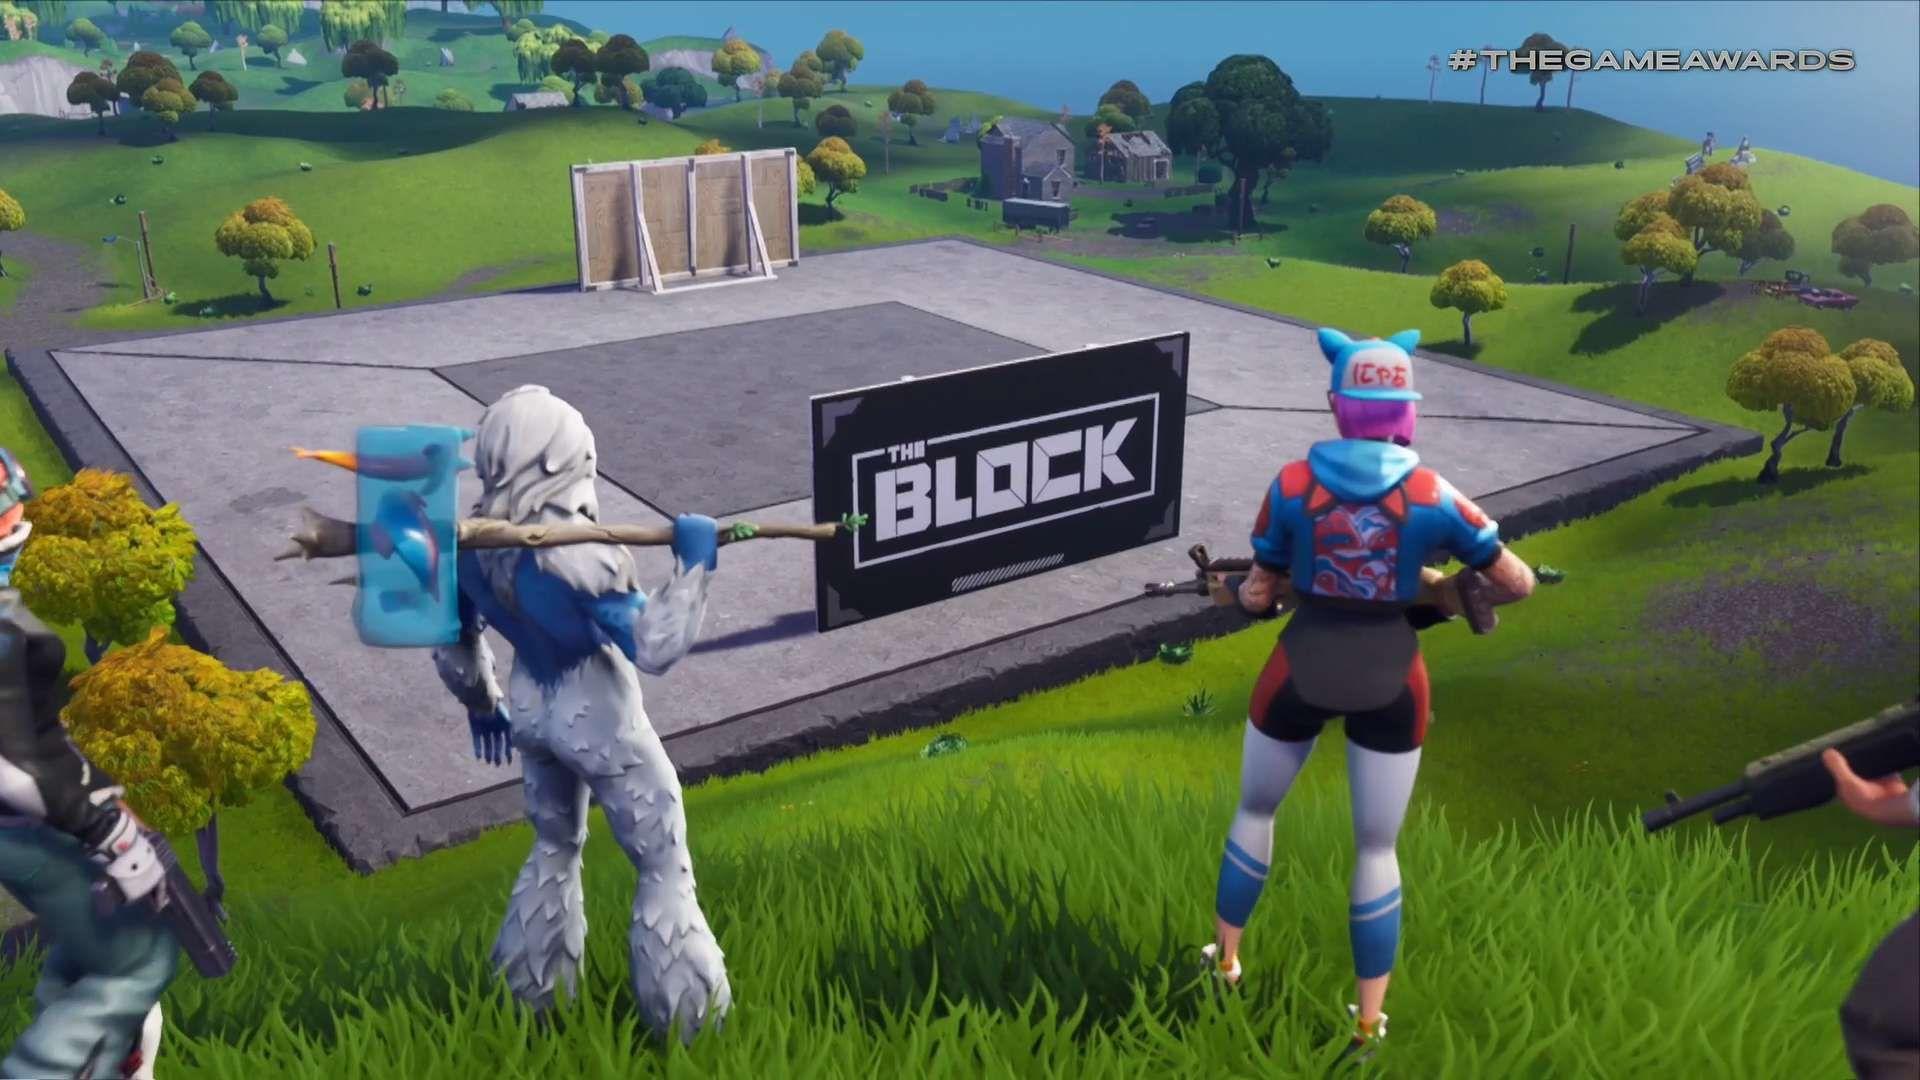 Fortnite The Block